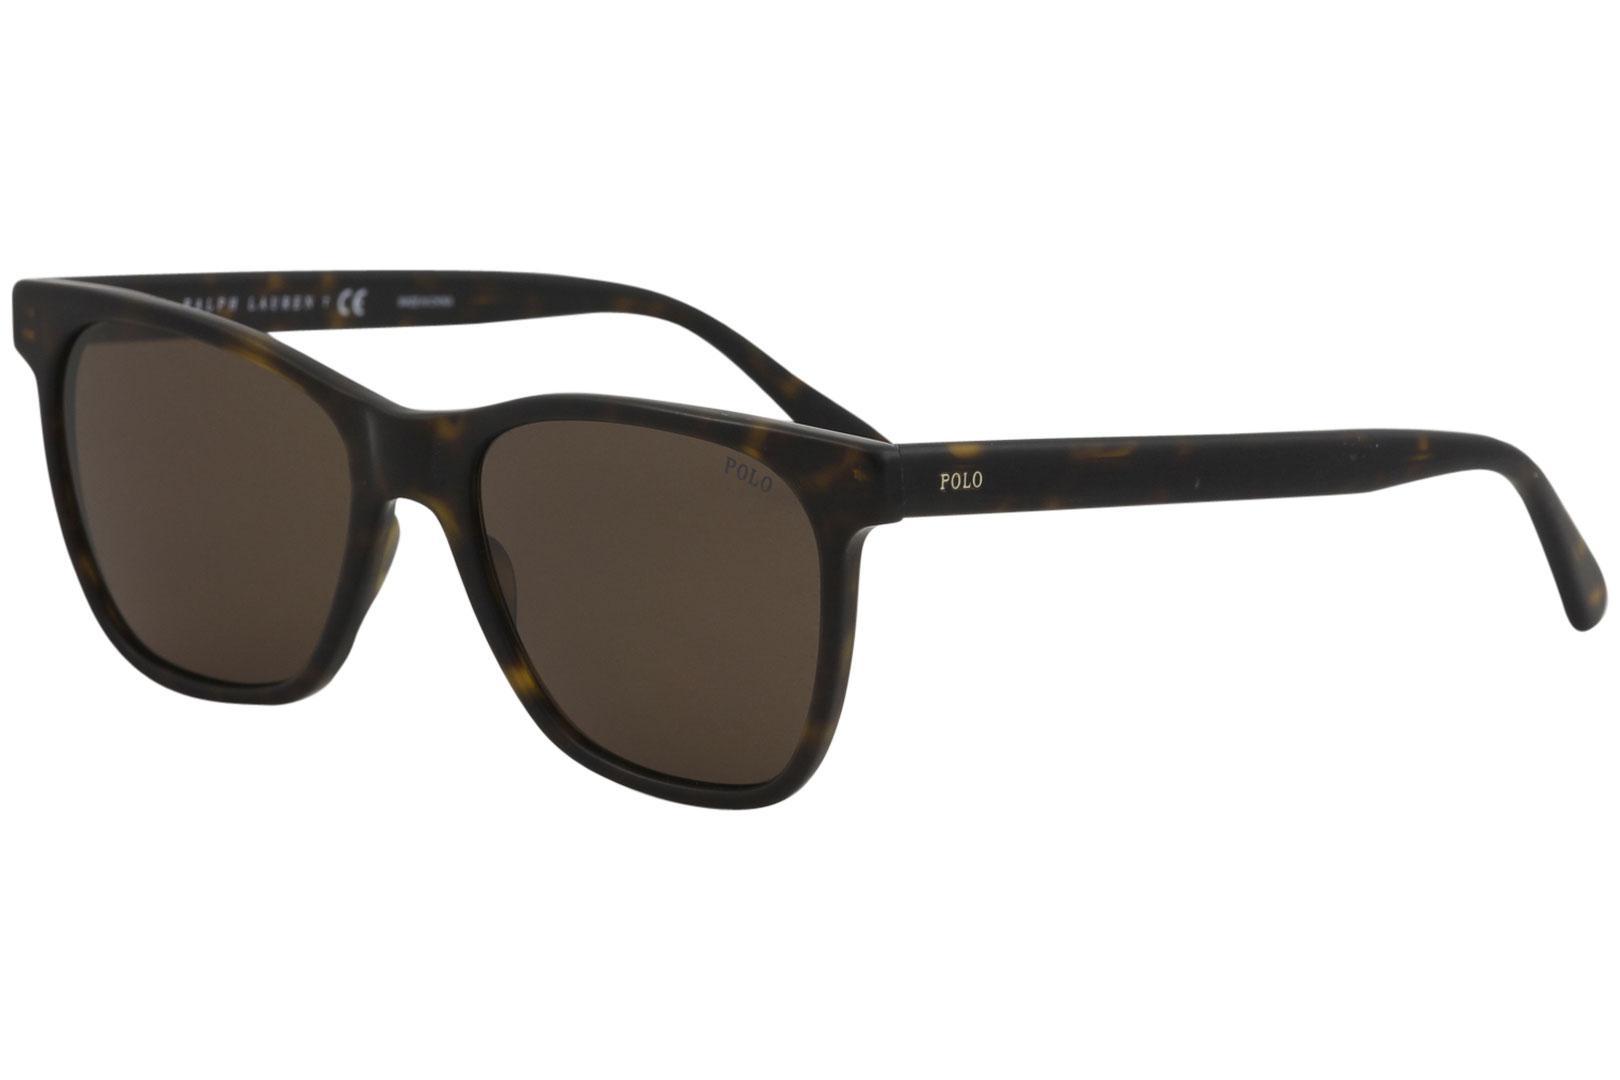 08ceea319d Polo Ralph Lauren Men s PH4128 PH 4128 Fashion Square Sunglasses